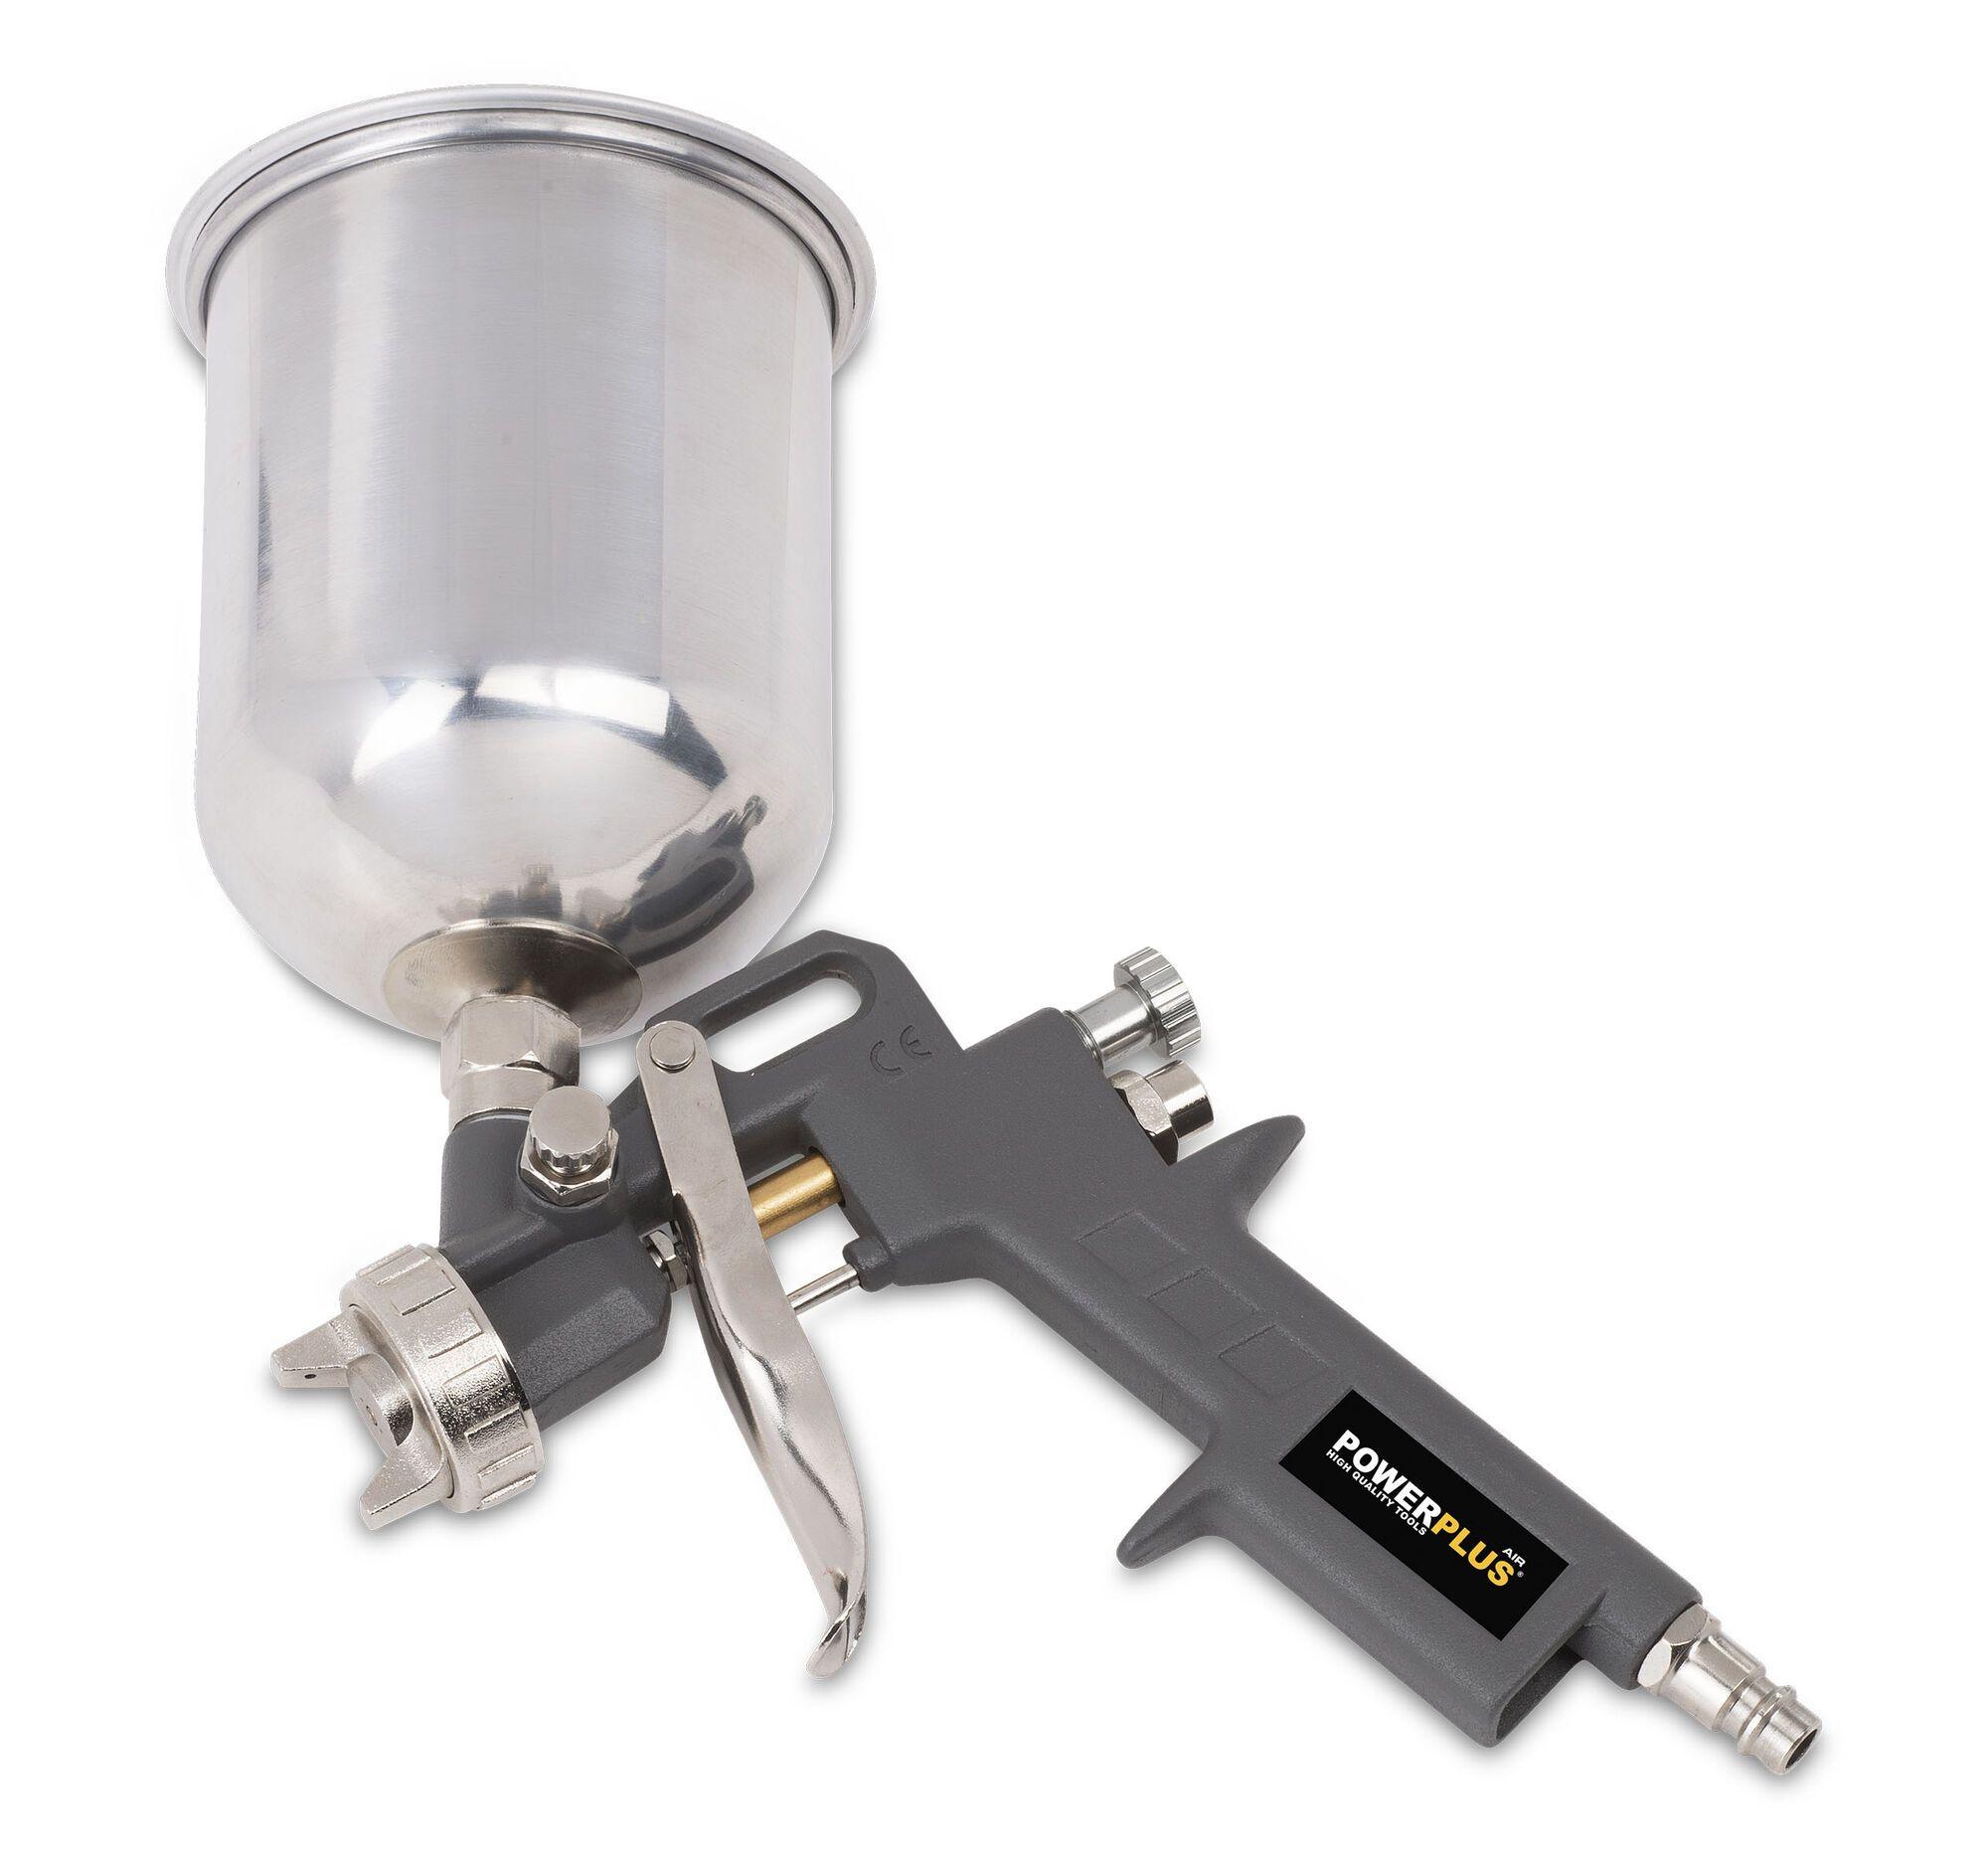 Powerplus POWAIR0105 Pneumatisch verfpistool | Verfspuit met bovenbeker (Verfspuiten pneumatisch)